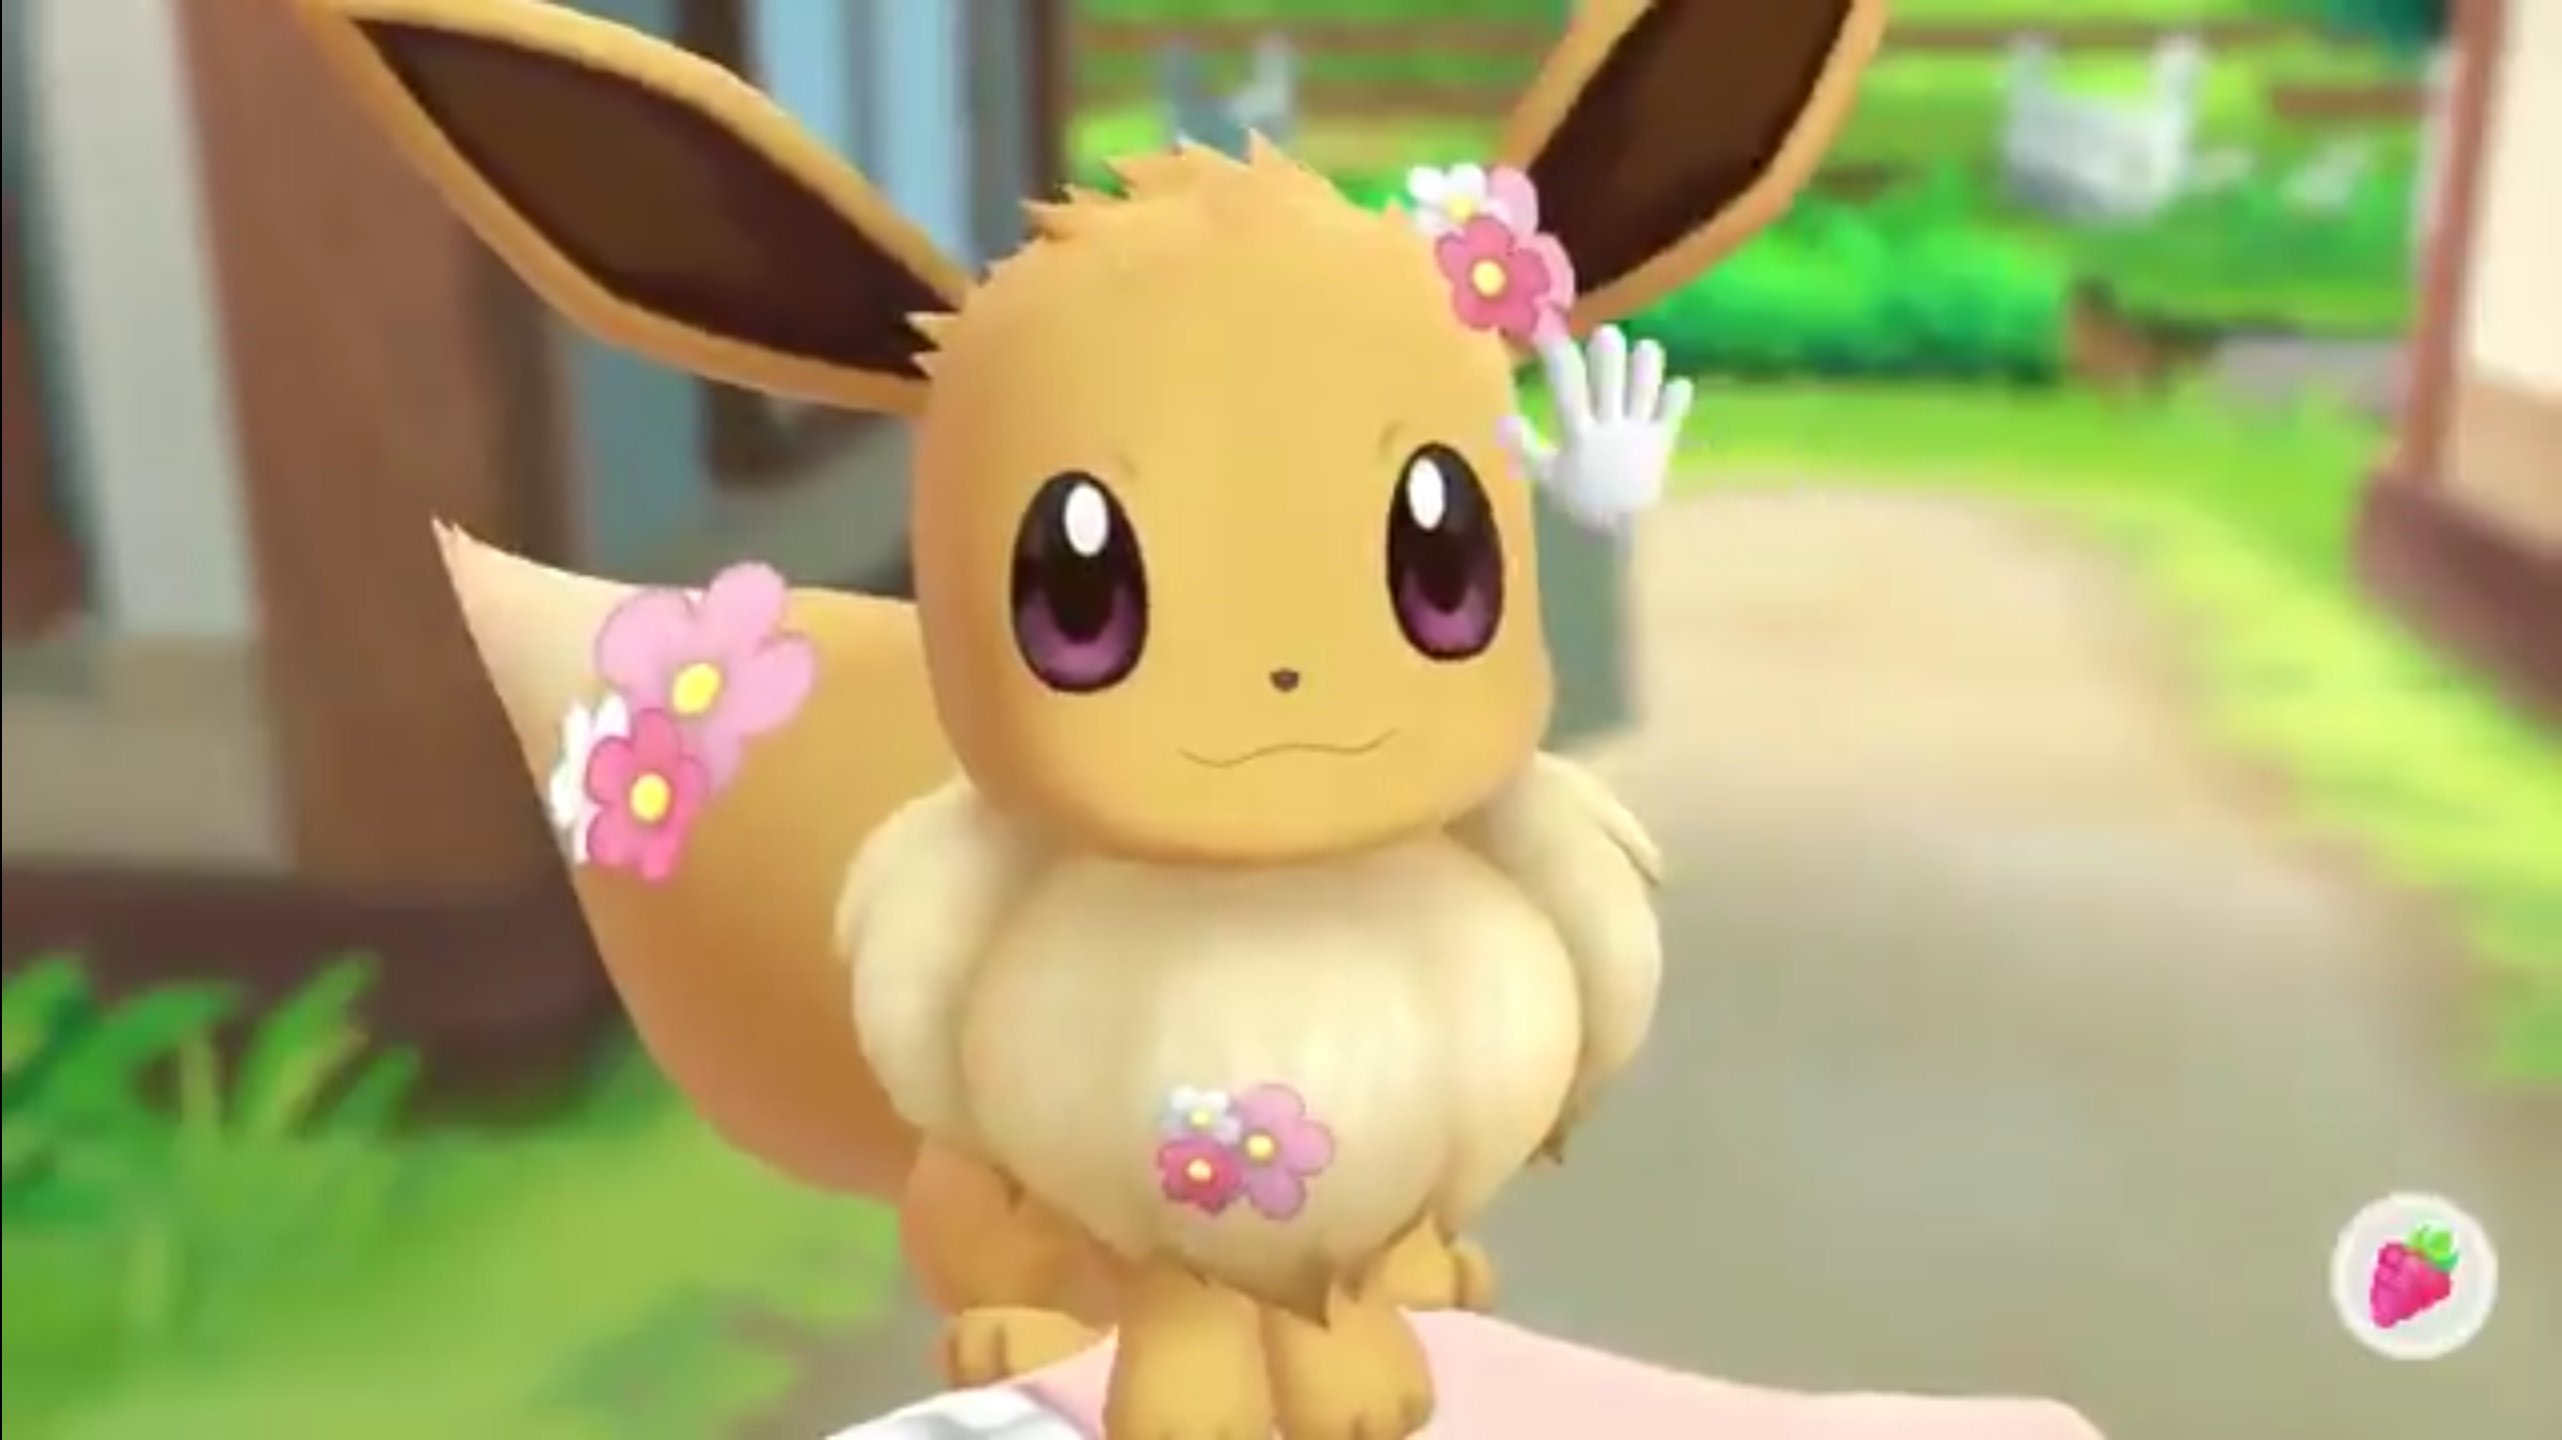 design intemporel Achat chaussures élégantes Pokemon Let's Go Pikachu and Eevee! Will Let You Customize ...